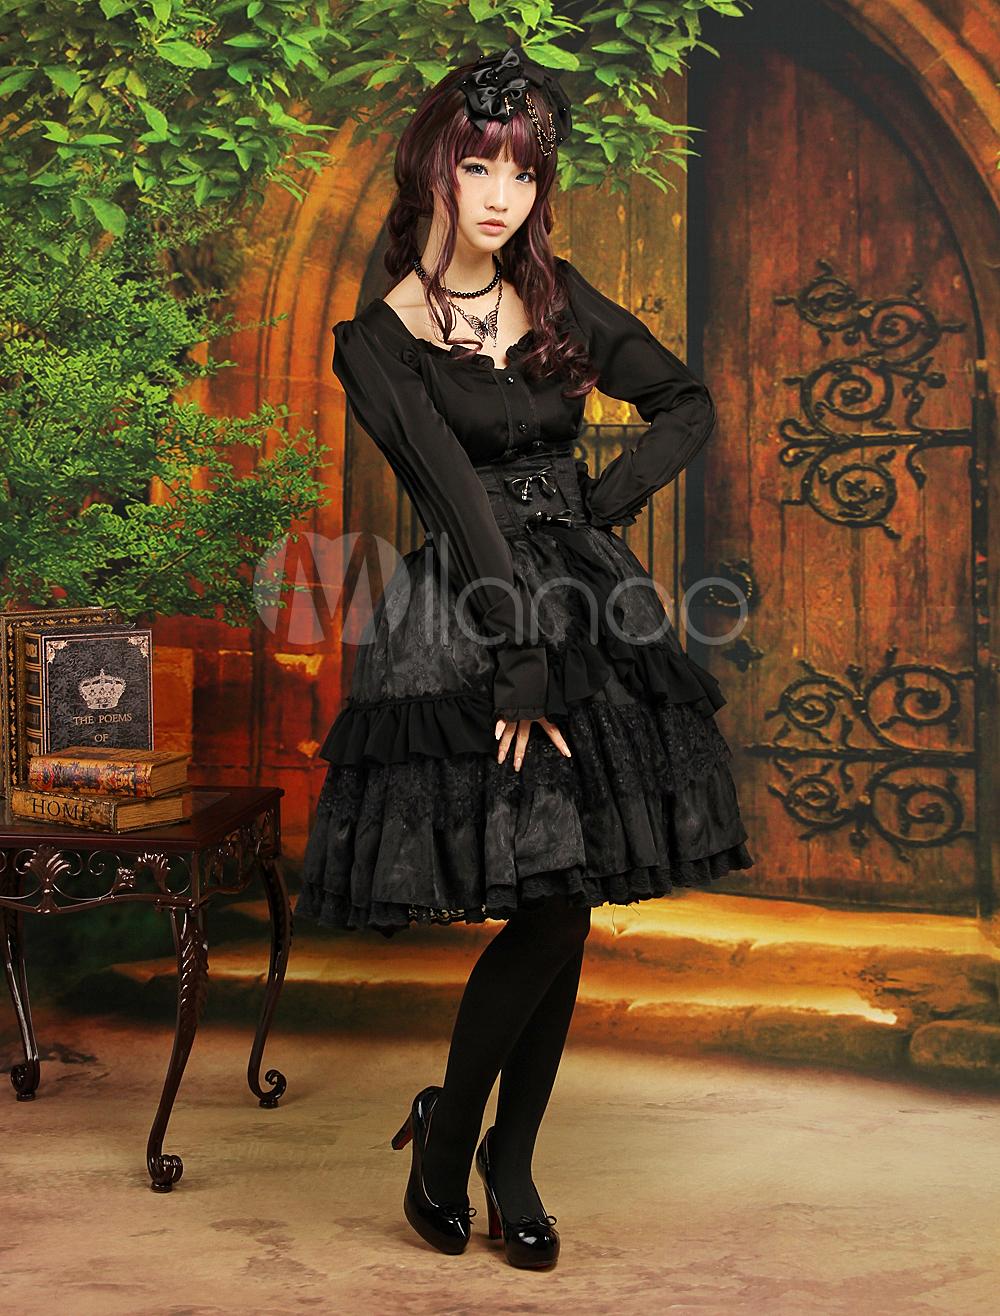 Gothic Black Layered Long Sleeves Elastic Silk Like Satin Jacquard Sweet Lolita Outfits